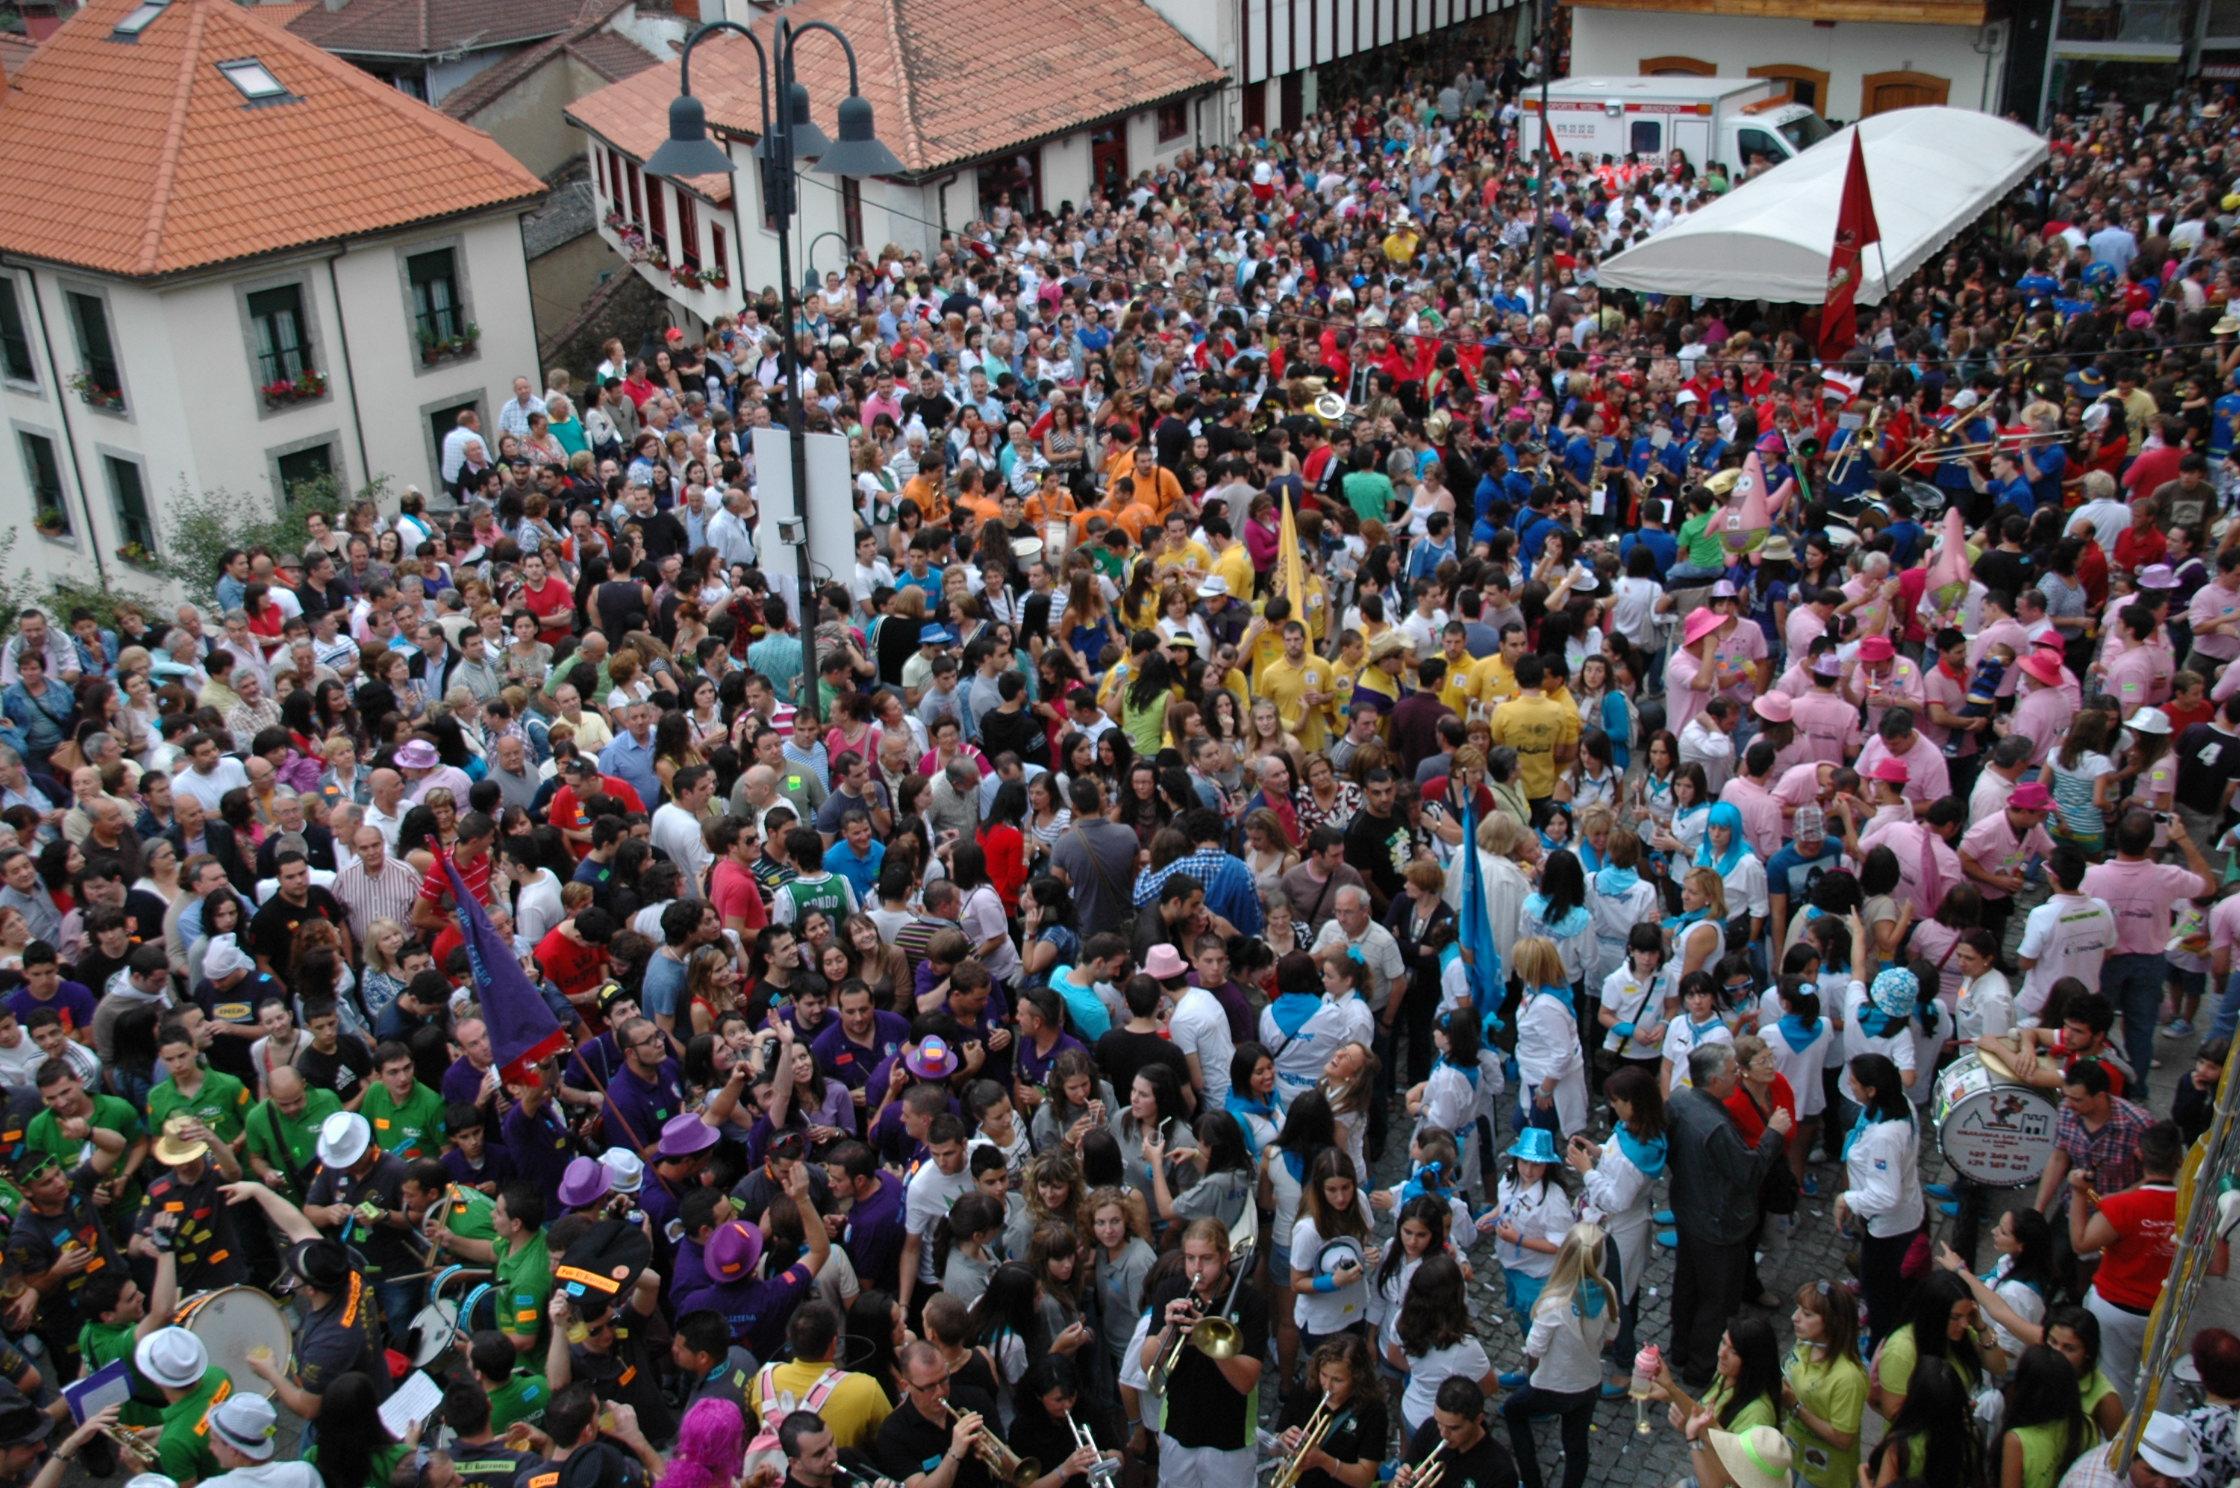 CANGAS DEL NARCEA.- Continúa la polémica en torno a las Fiestas del Carmen